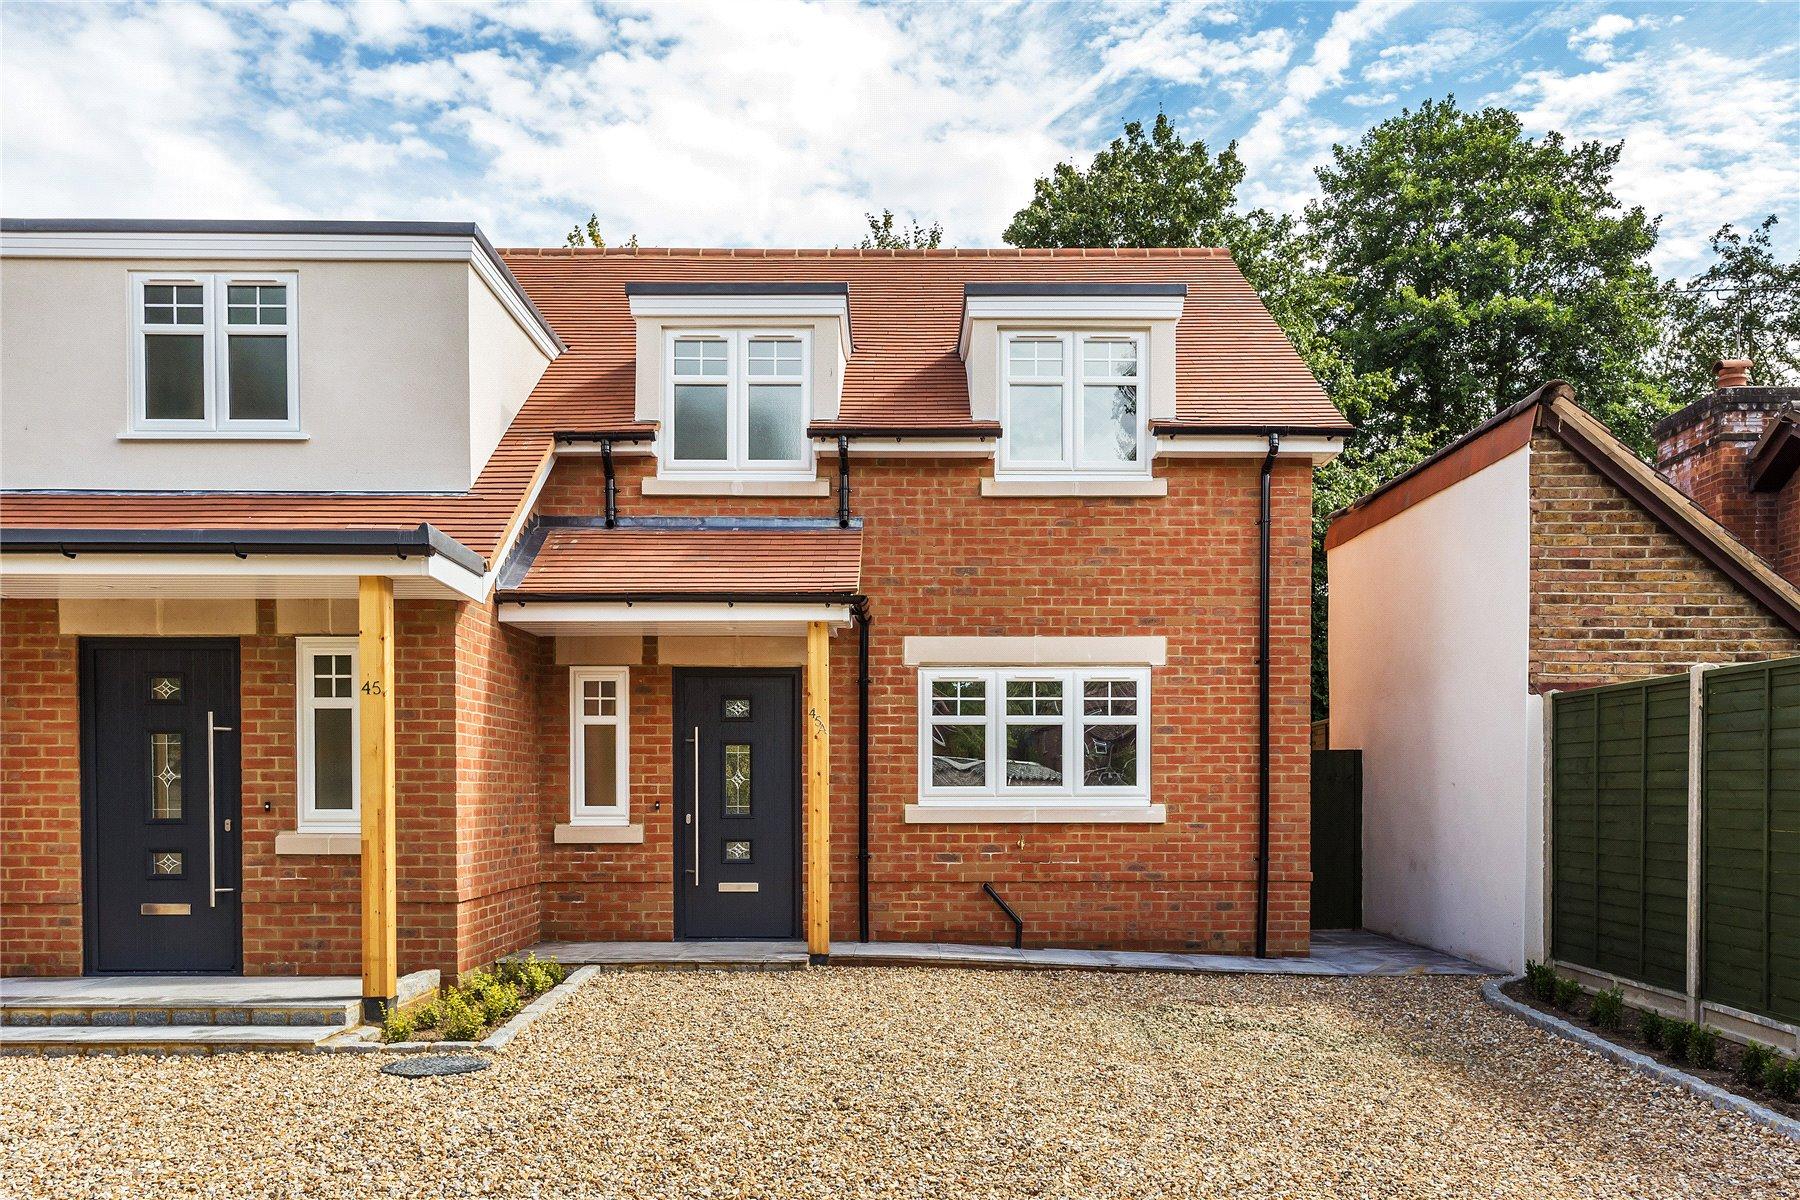 3 Bedrooms Semi Detached House for sale in Horsell Moor, Woking, Surrey, GU21